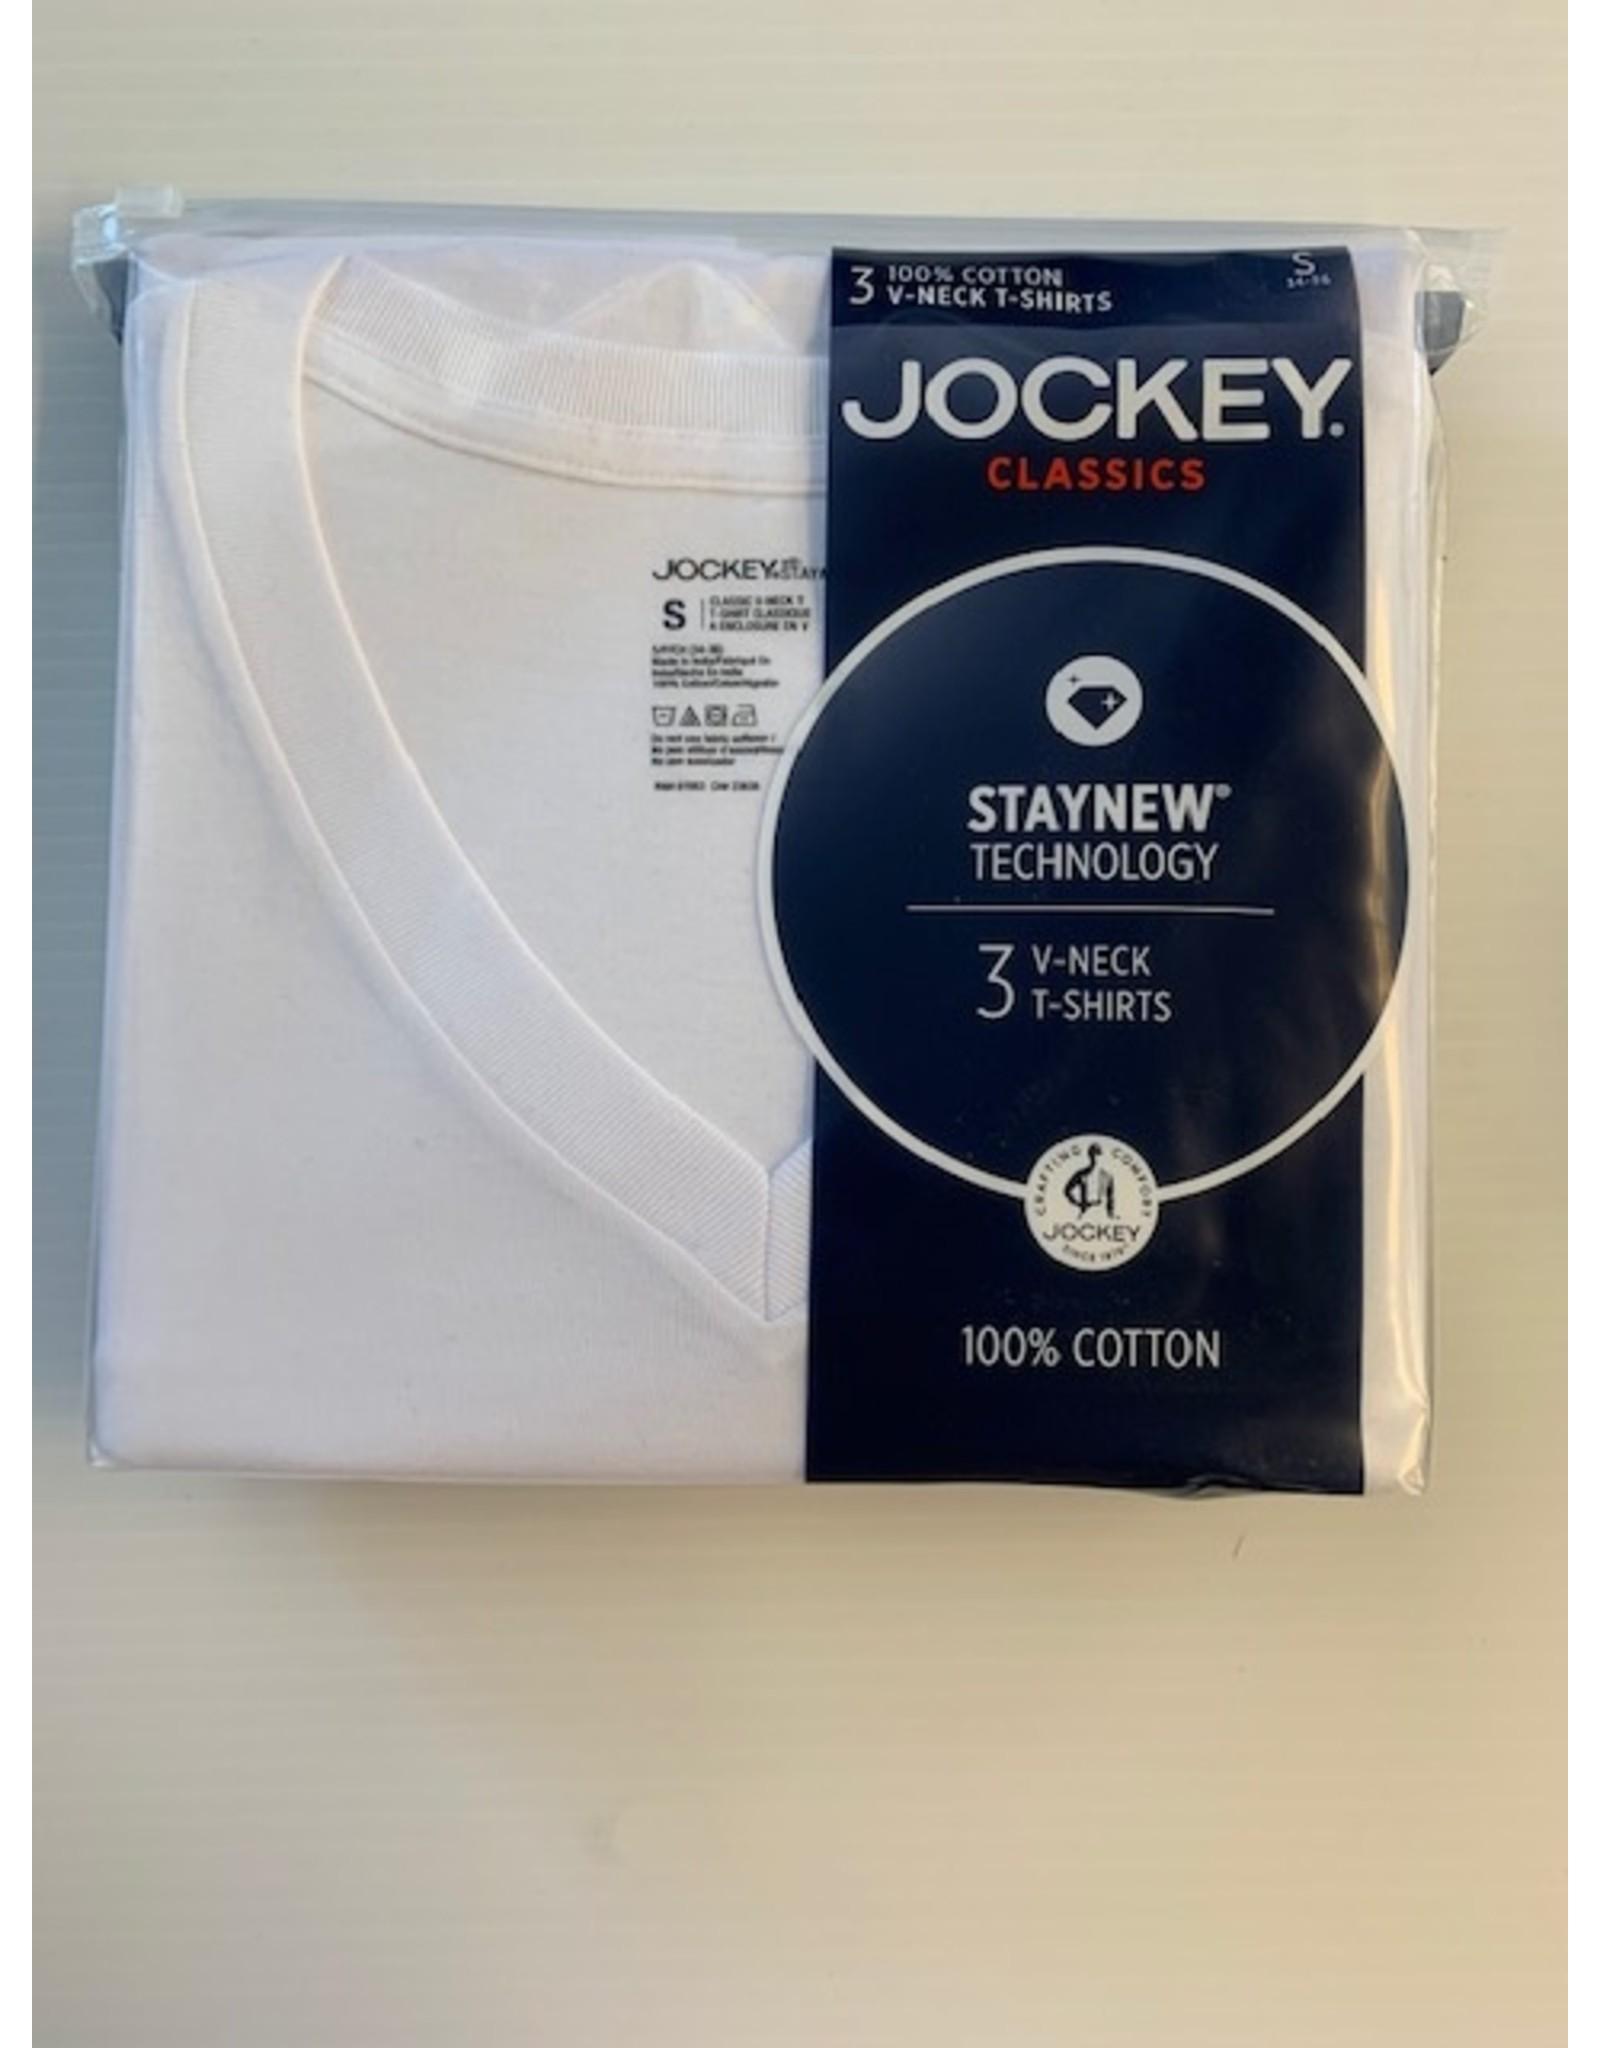 Jockey Men's Jockey V-Neck T-Shirts